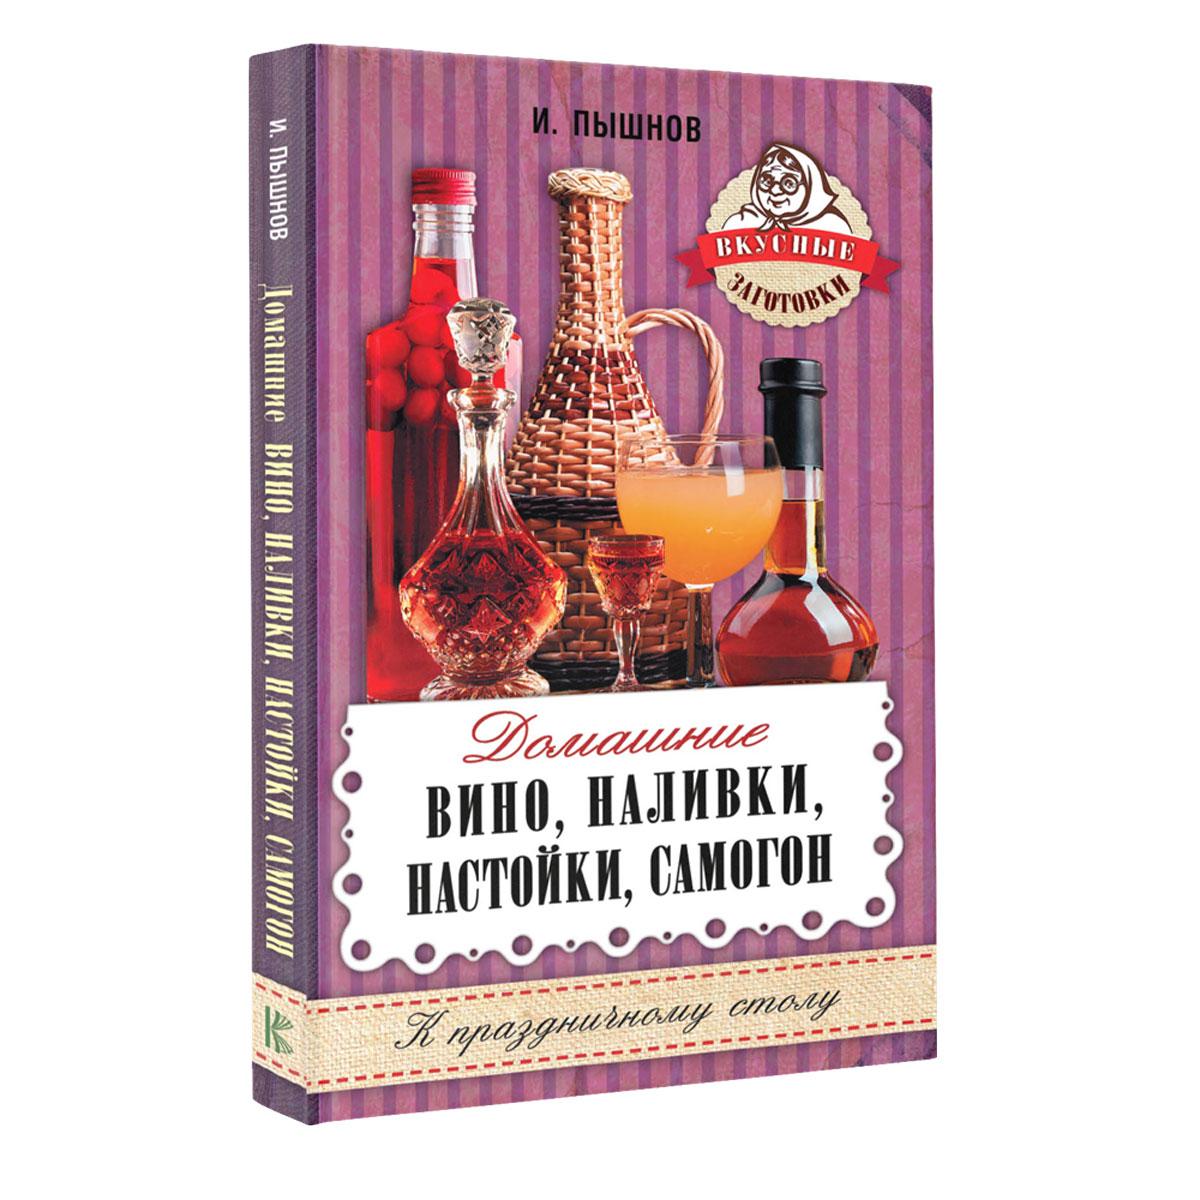 И. Пышнов Домашнее вино, наливки, настойки, самогон